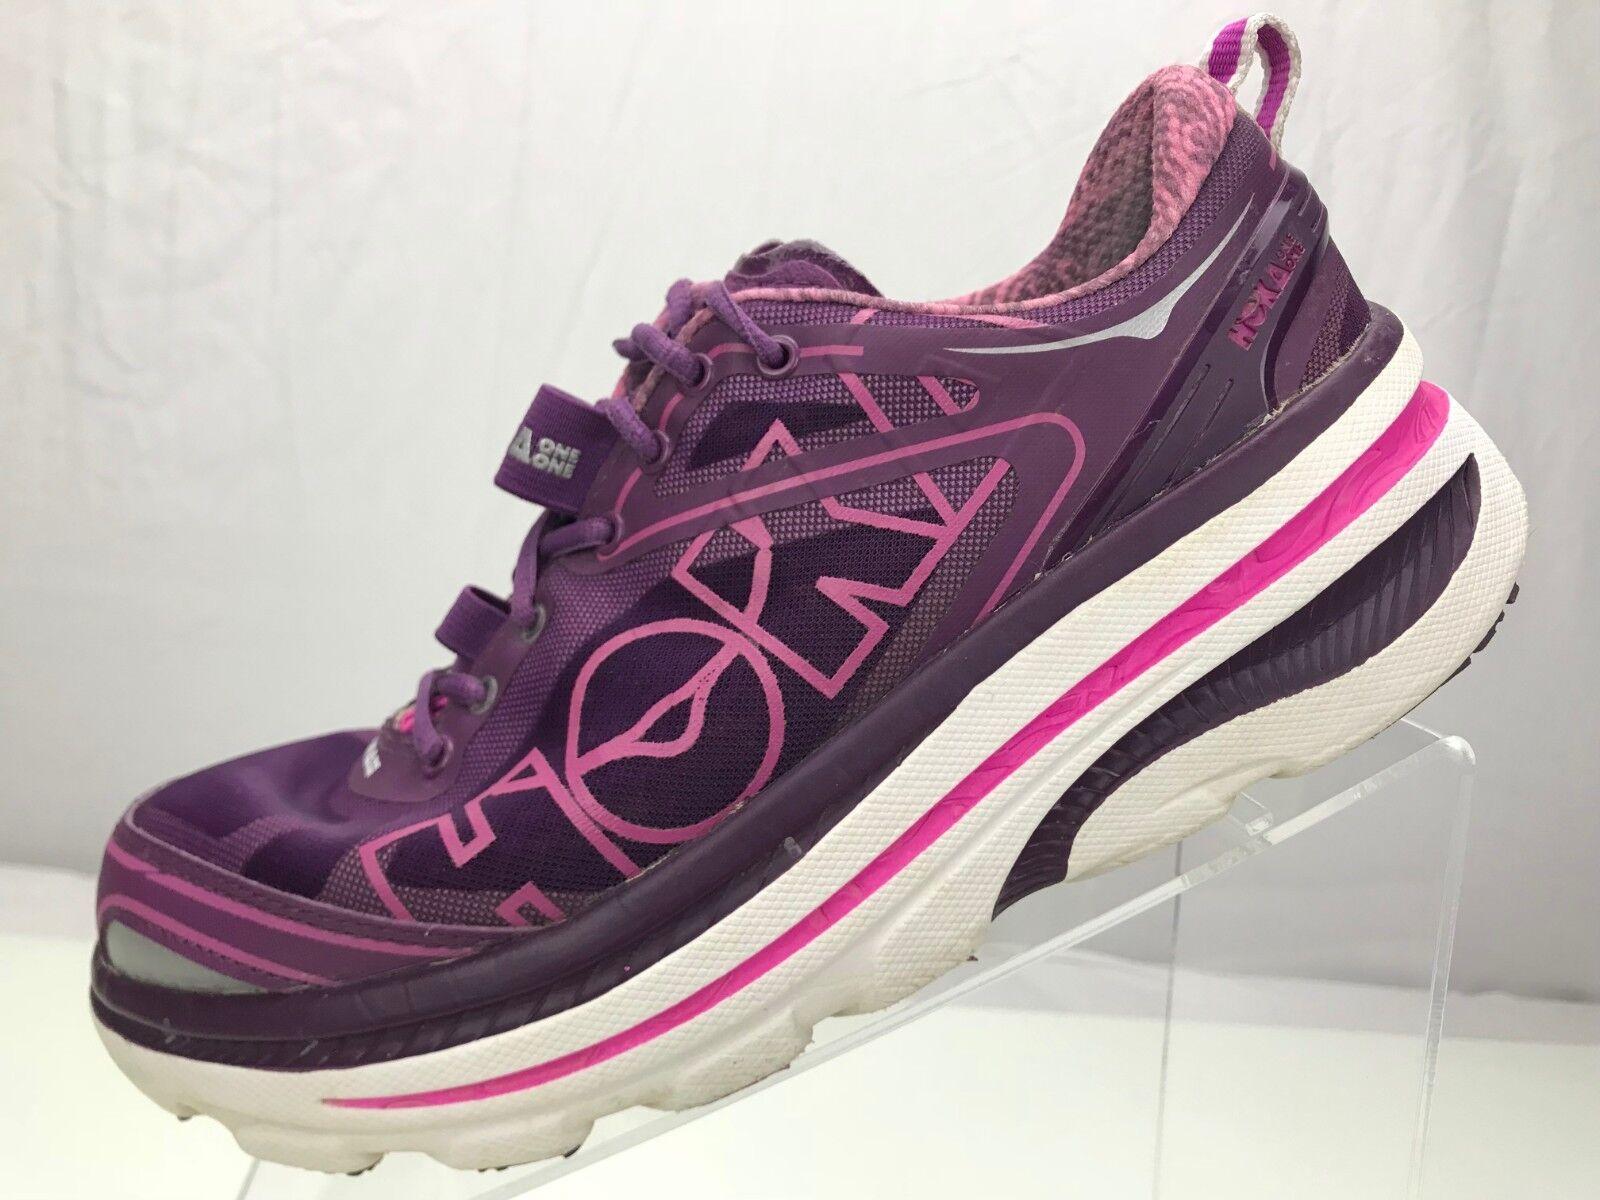 Hoka One One Bondi 3 - Running Training Athletic Turnschuhe Turnschuhe Turnschuhe damen's 8 lila Rosa 4cfd68